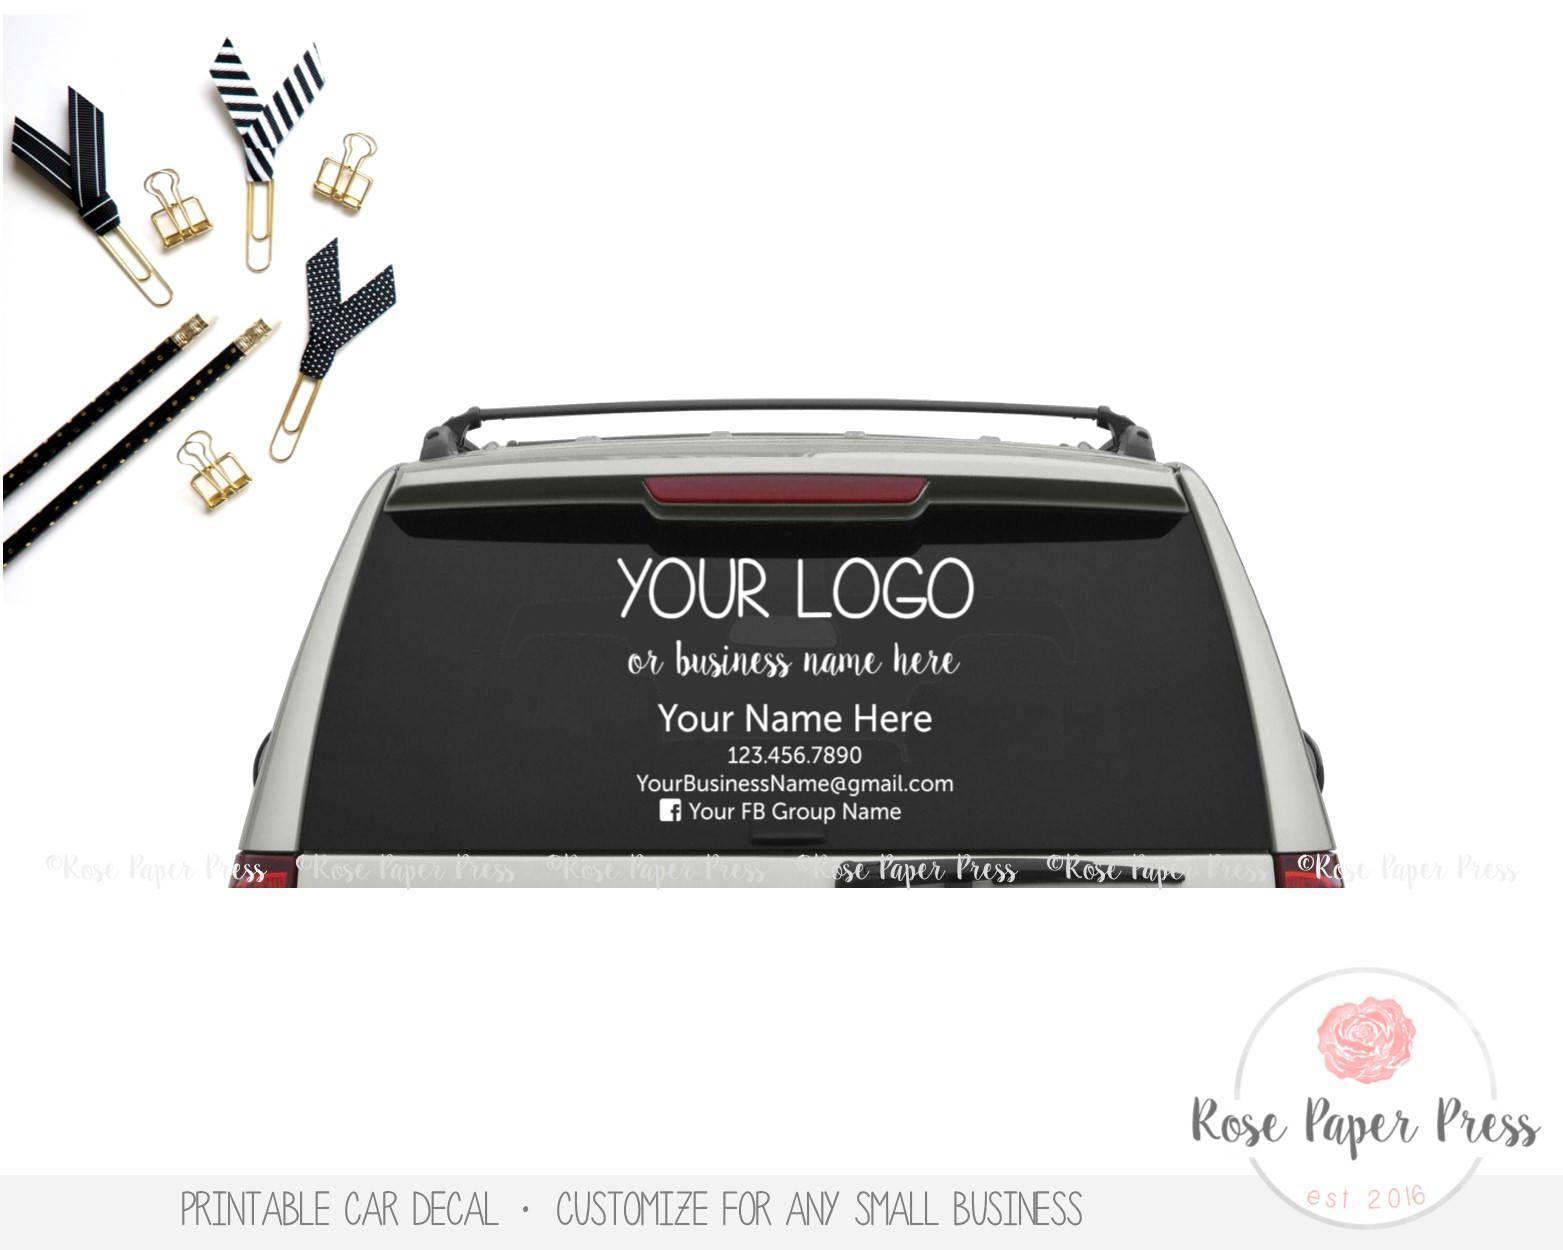 Car Decal Custom Printable Decal Small Business Marketing - Custom car decals businesswindow decals